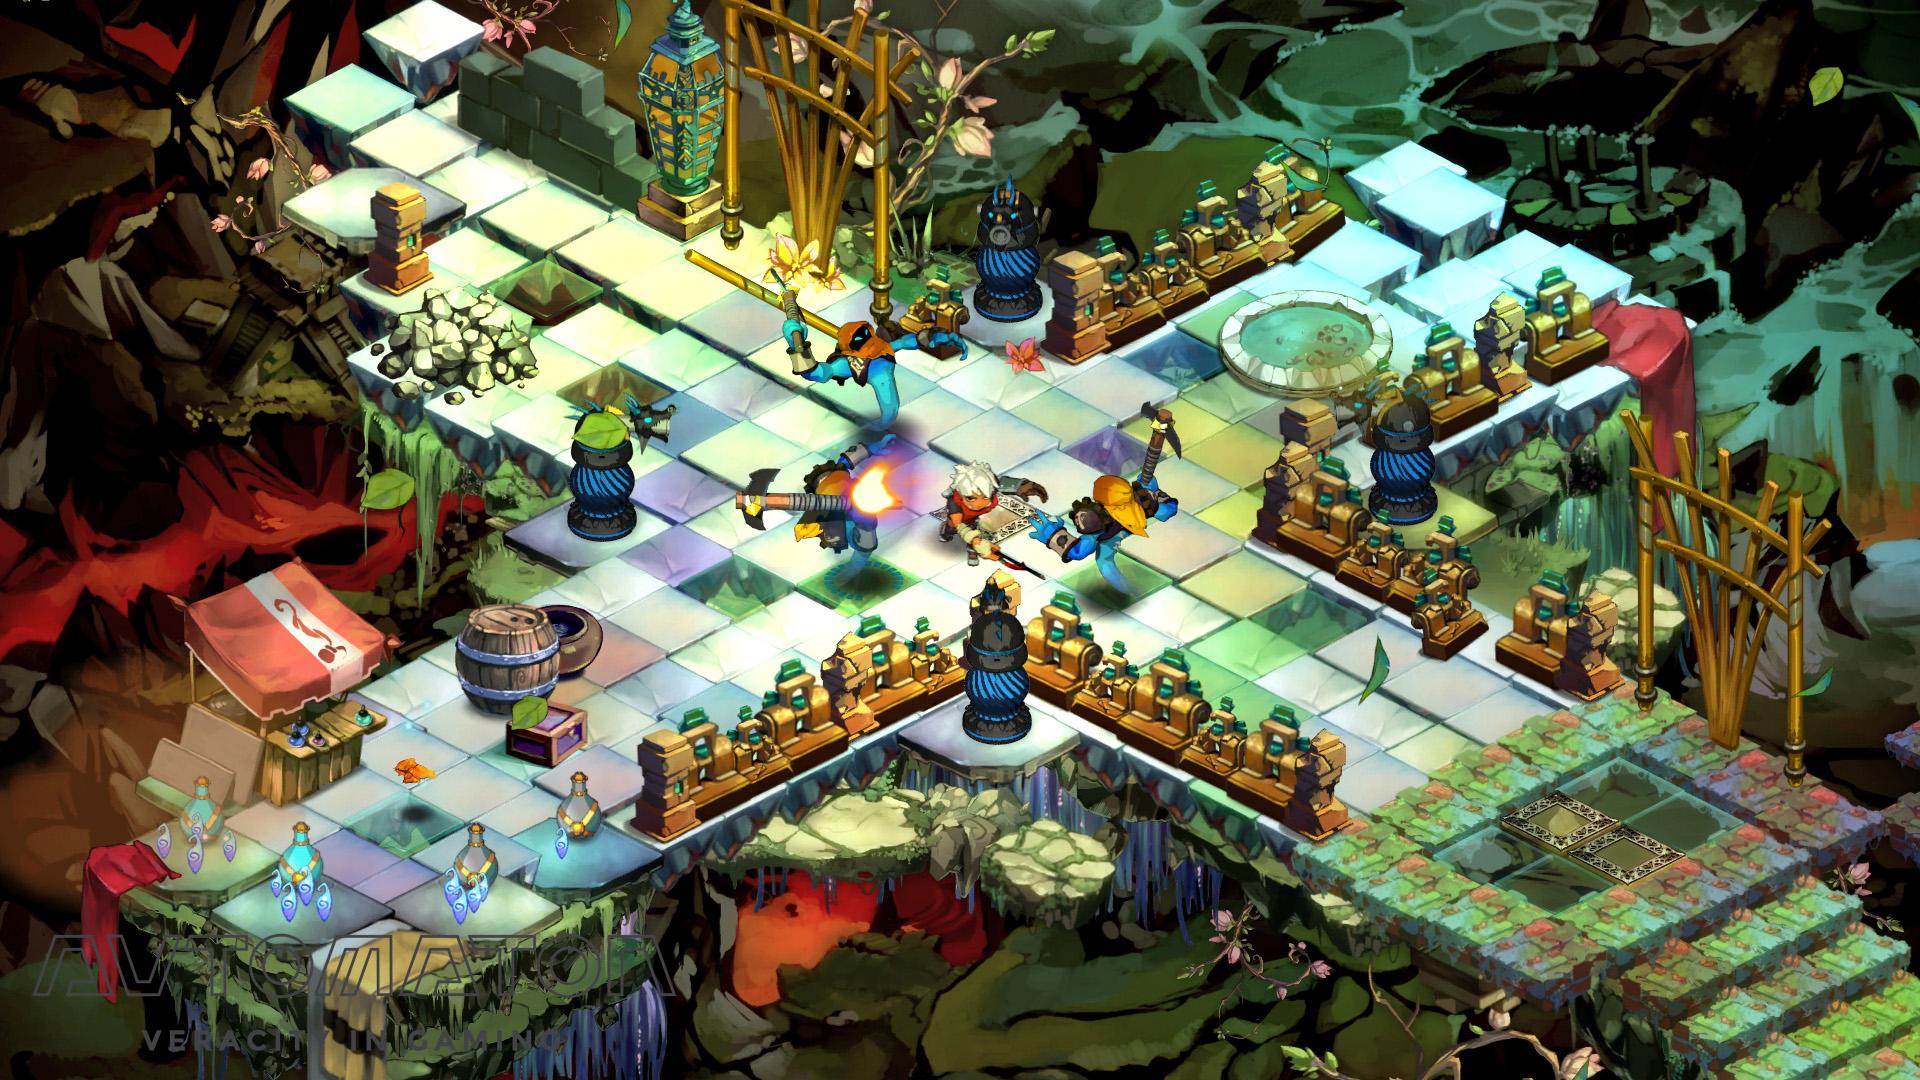 Supergiant Gamesのデビュー作『Bastion』